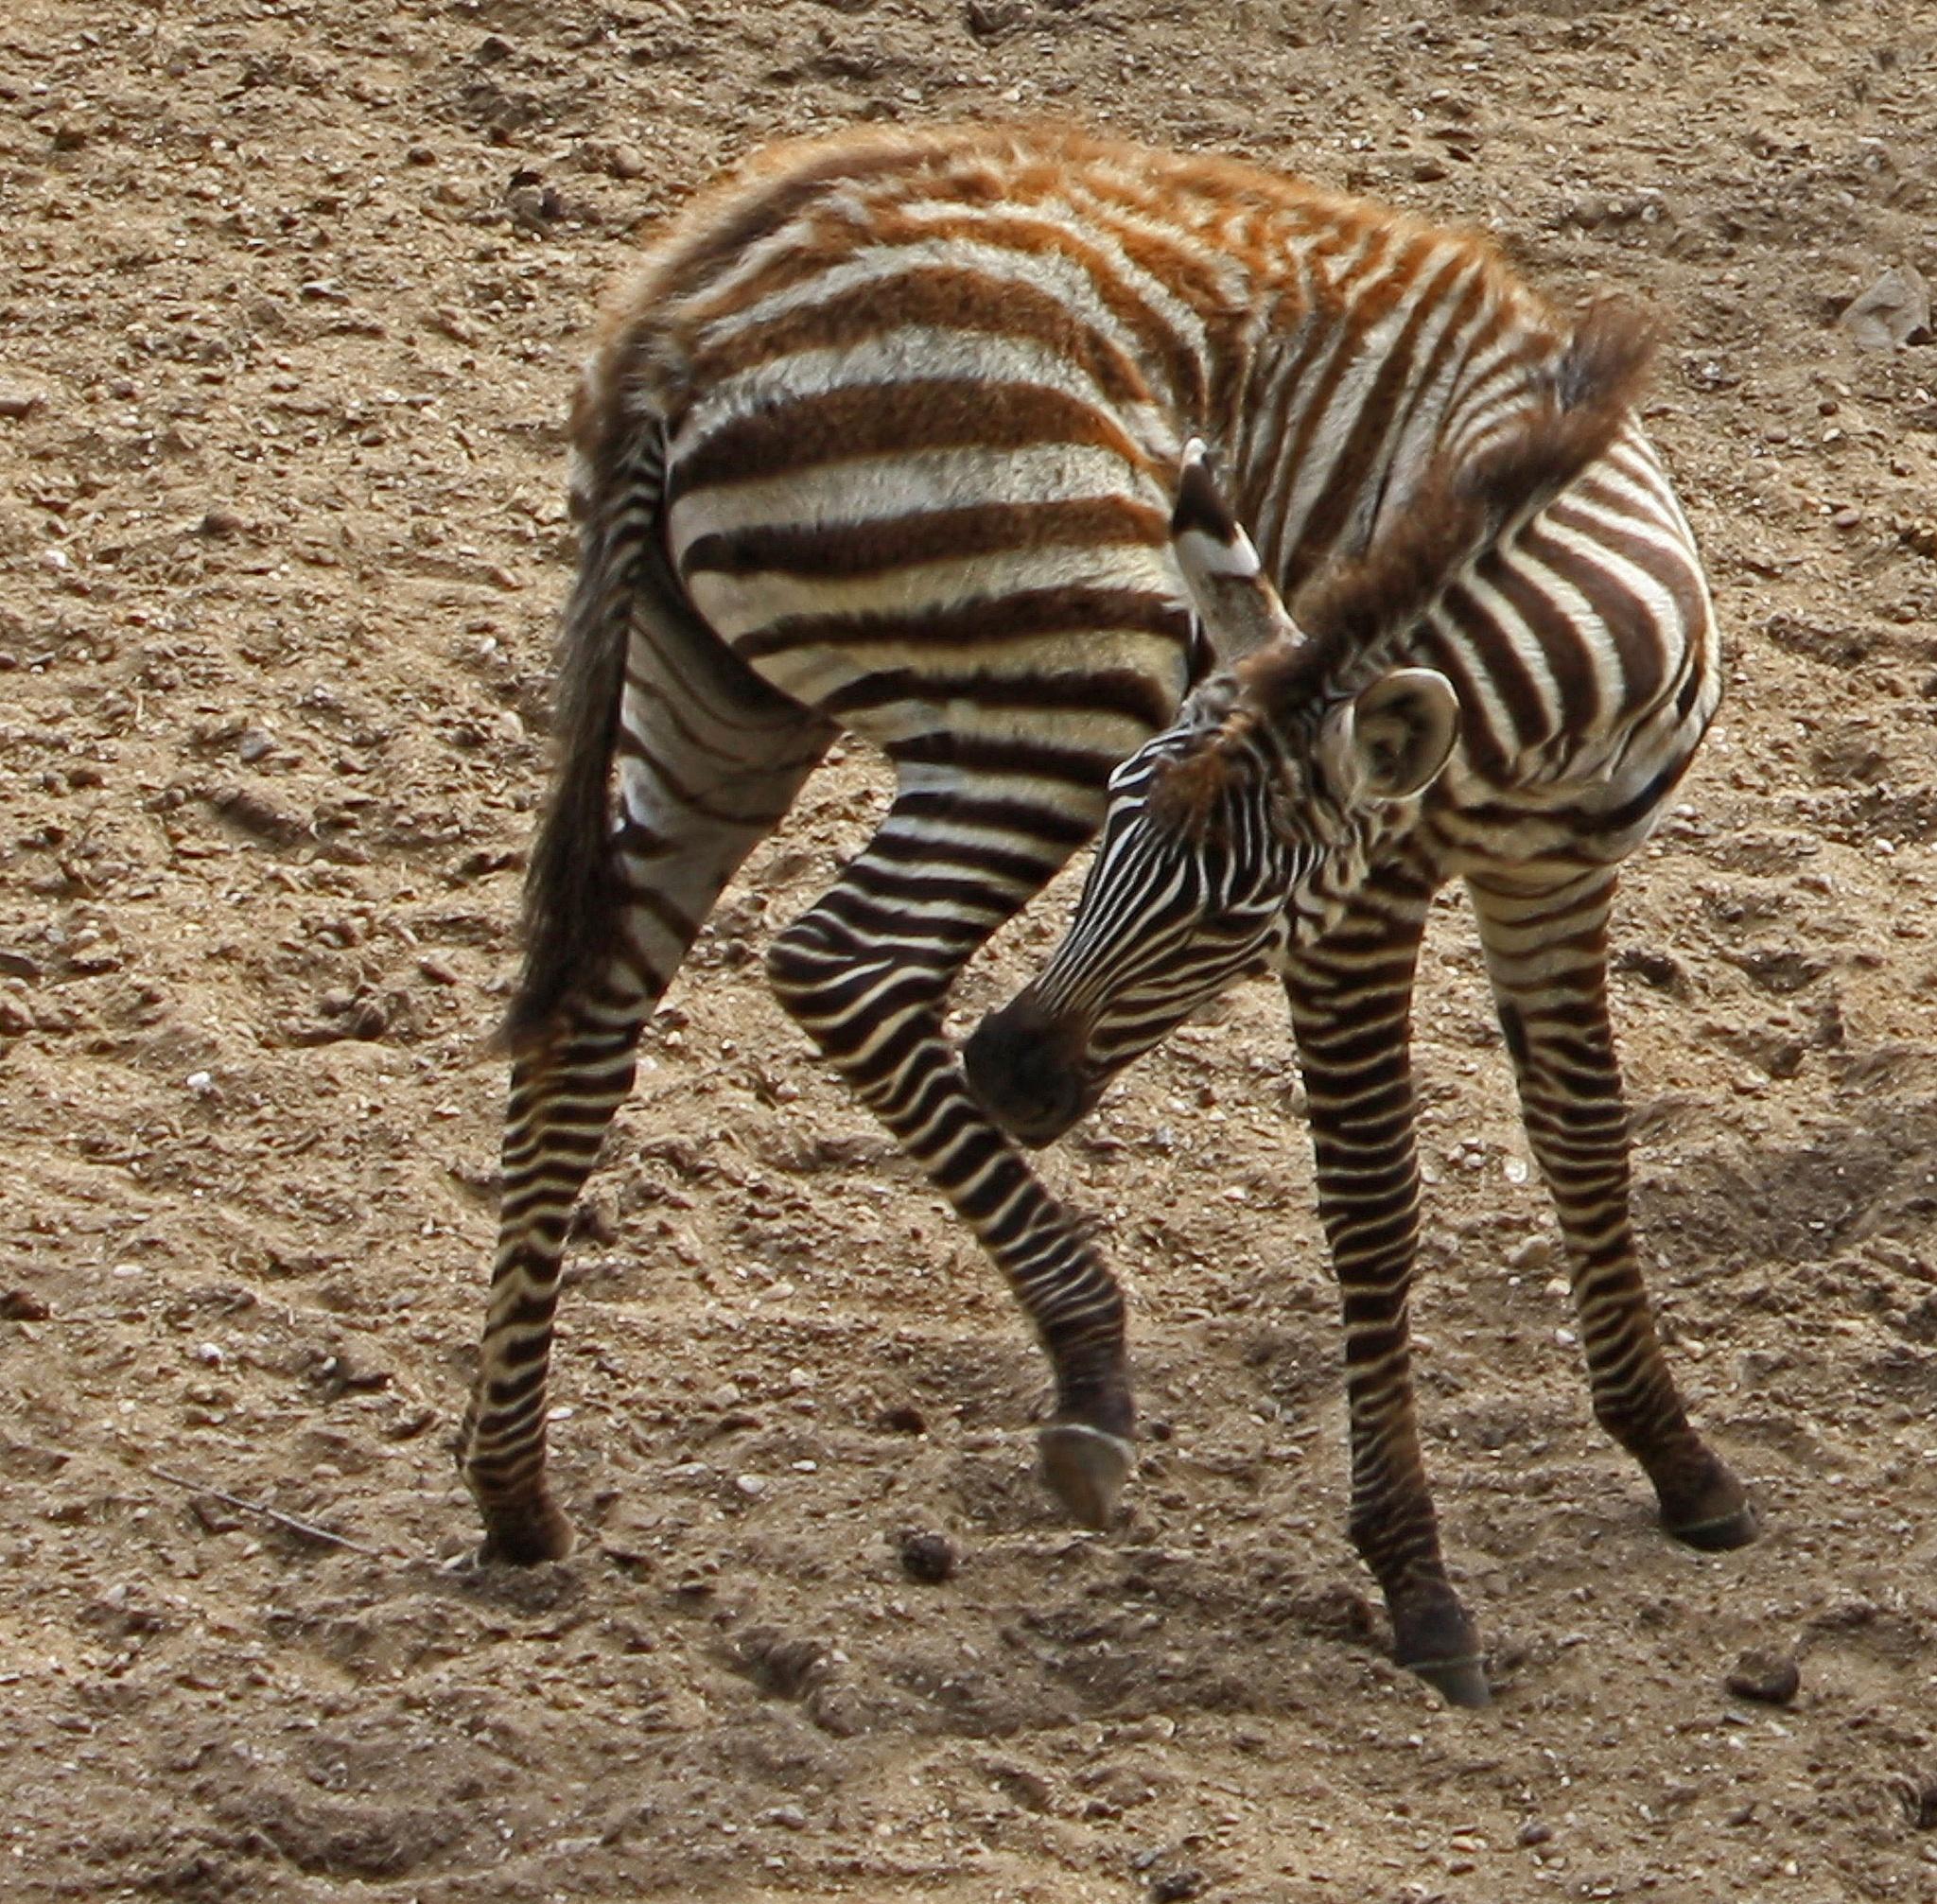 The little Zebra by Bob66